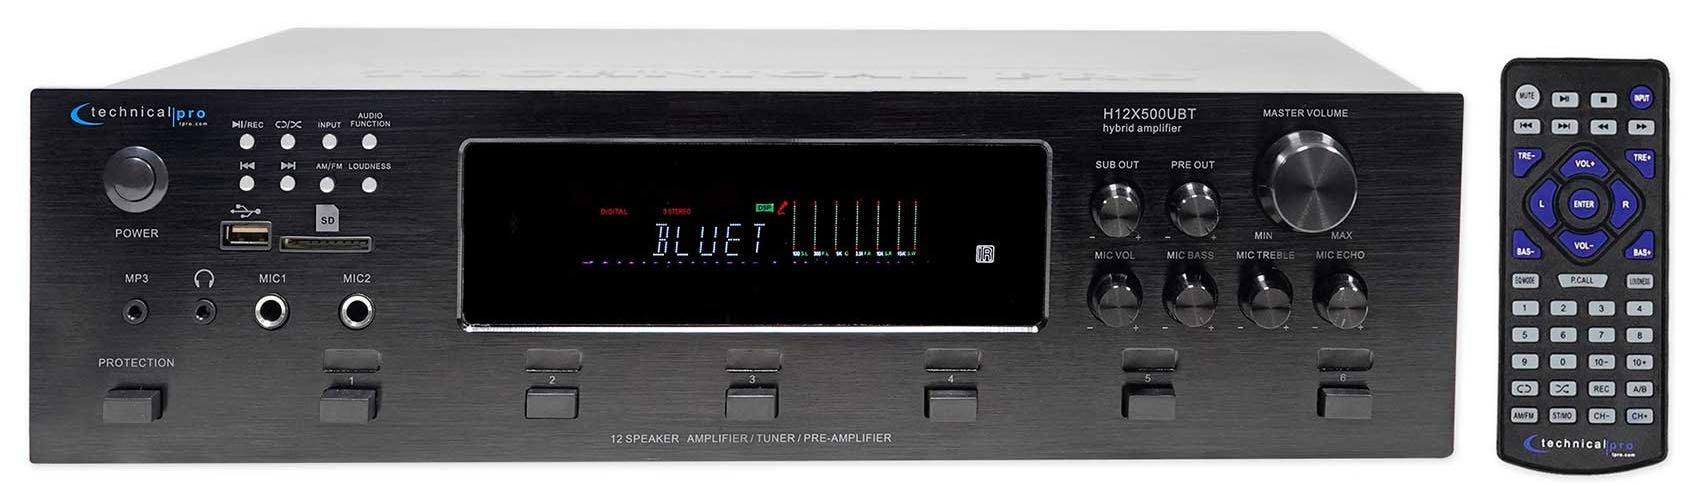 Technical Pro H12X500UBT 6000w Professional Bluetooth Amplifier Receiver USB, SD